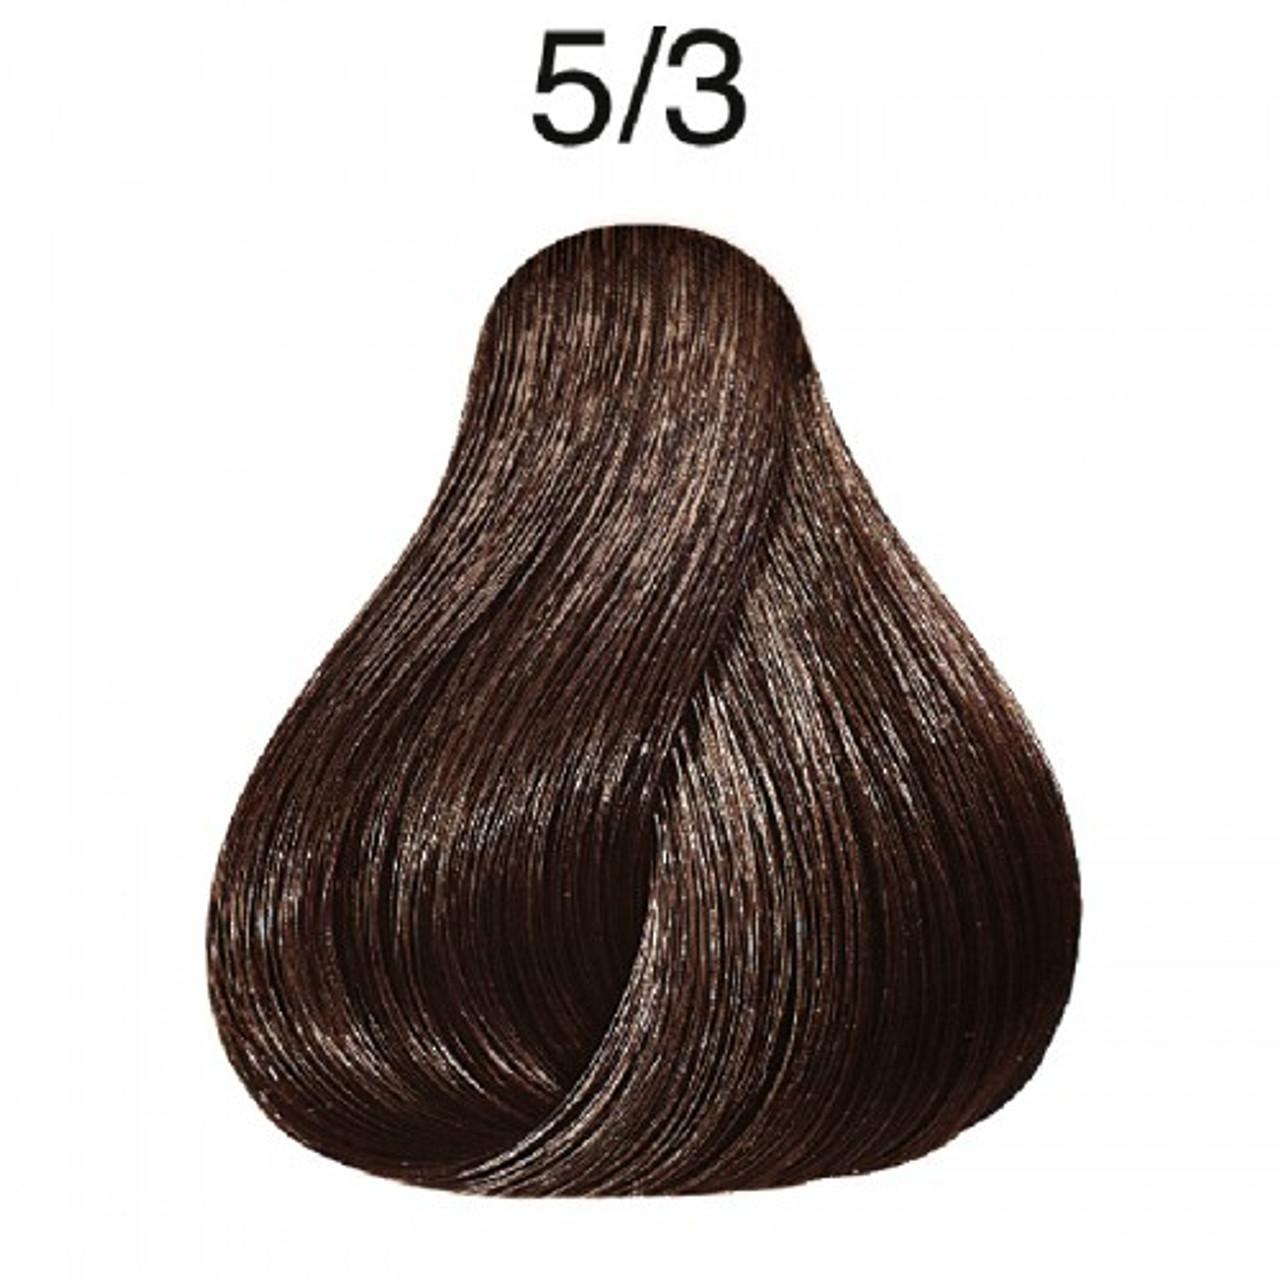 Wella 5/3 Semi-Permanent Hair Color: Light Golden Brown